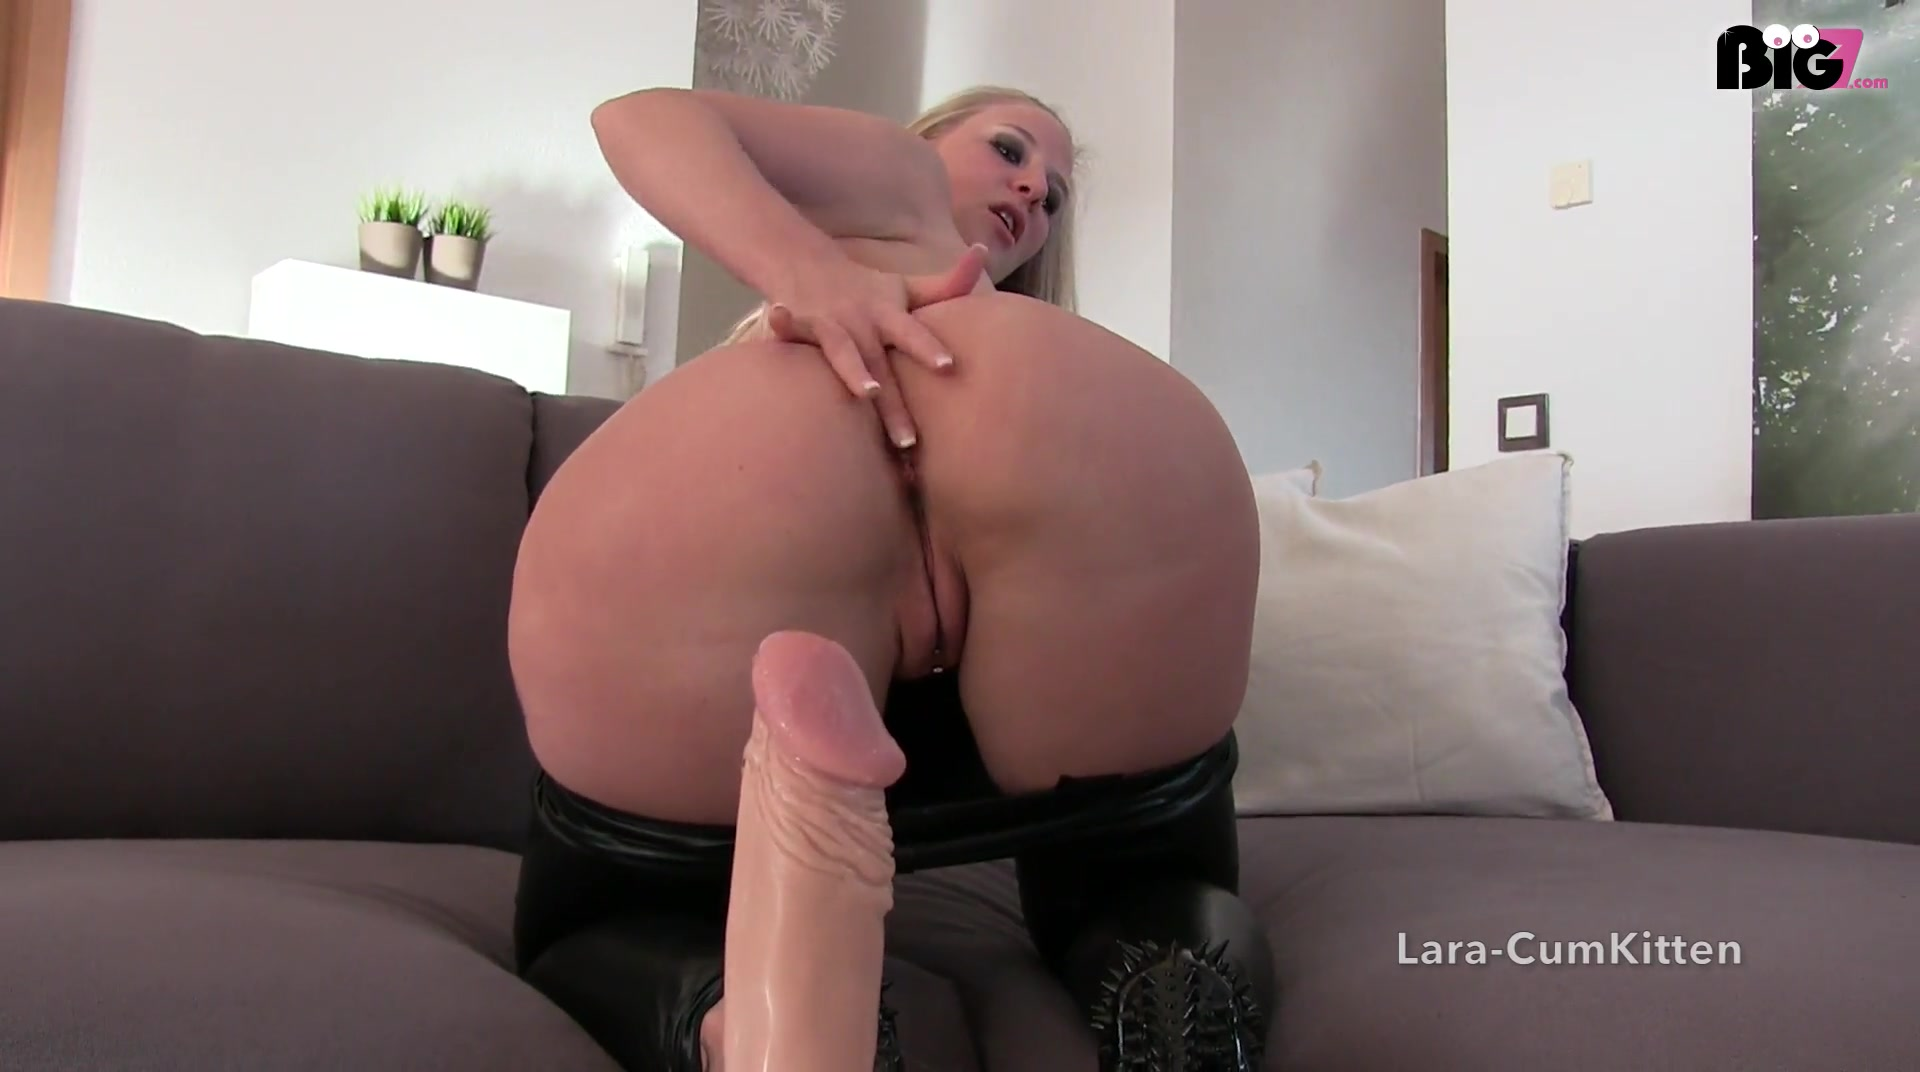 lara cumkitten anal